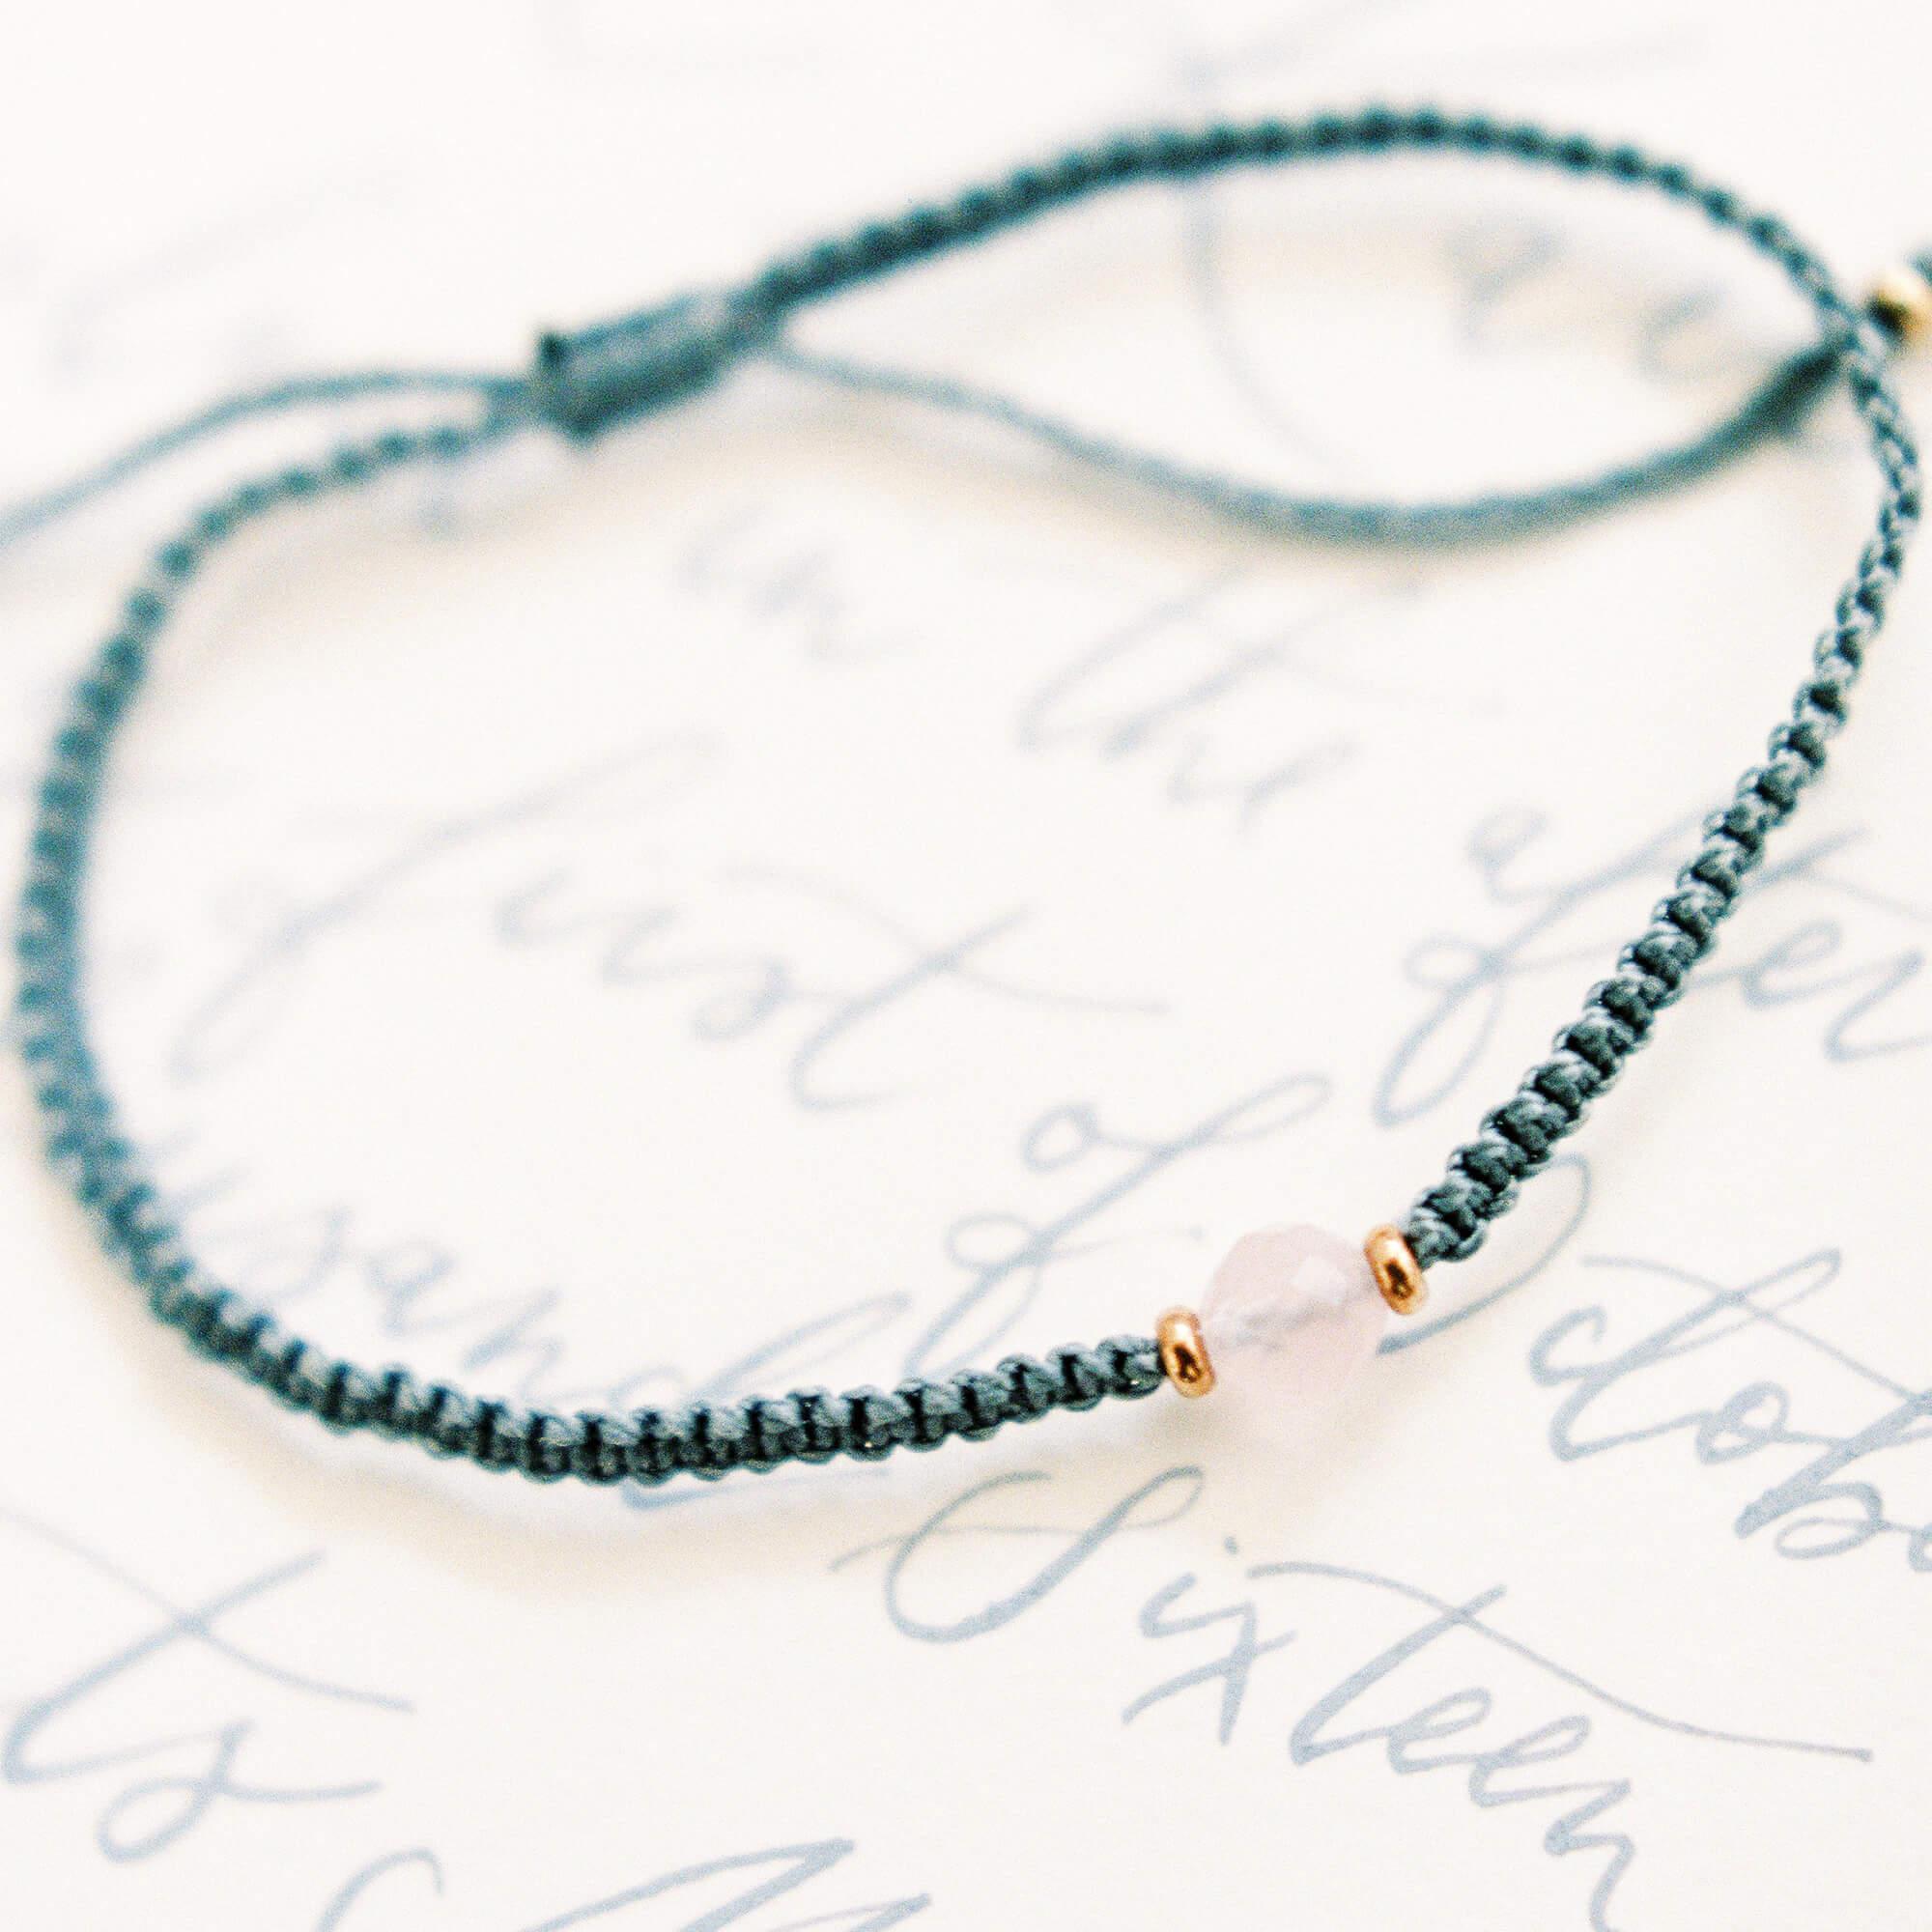 Gemstone and gold bead bracelet